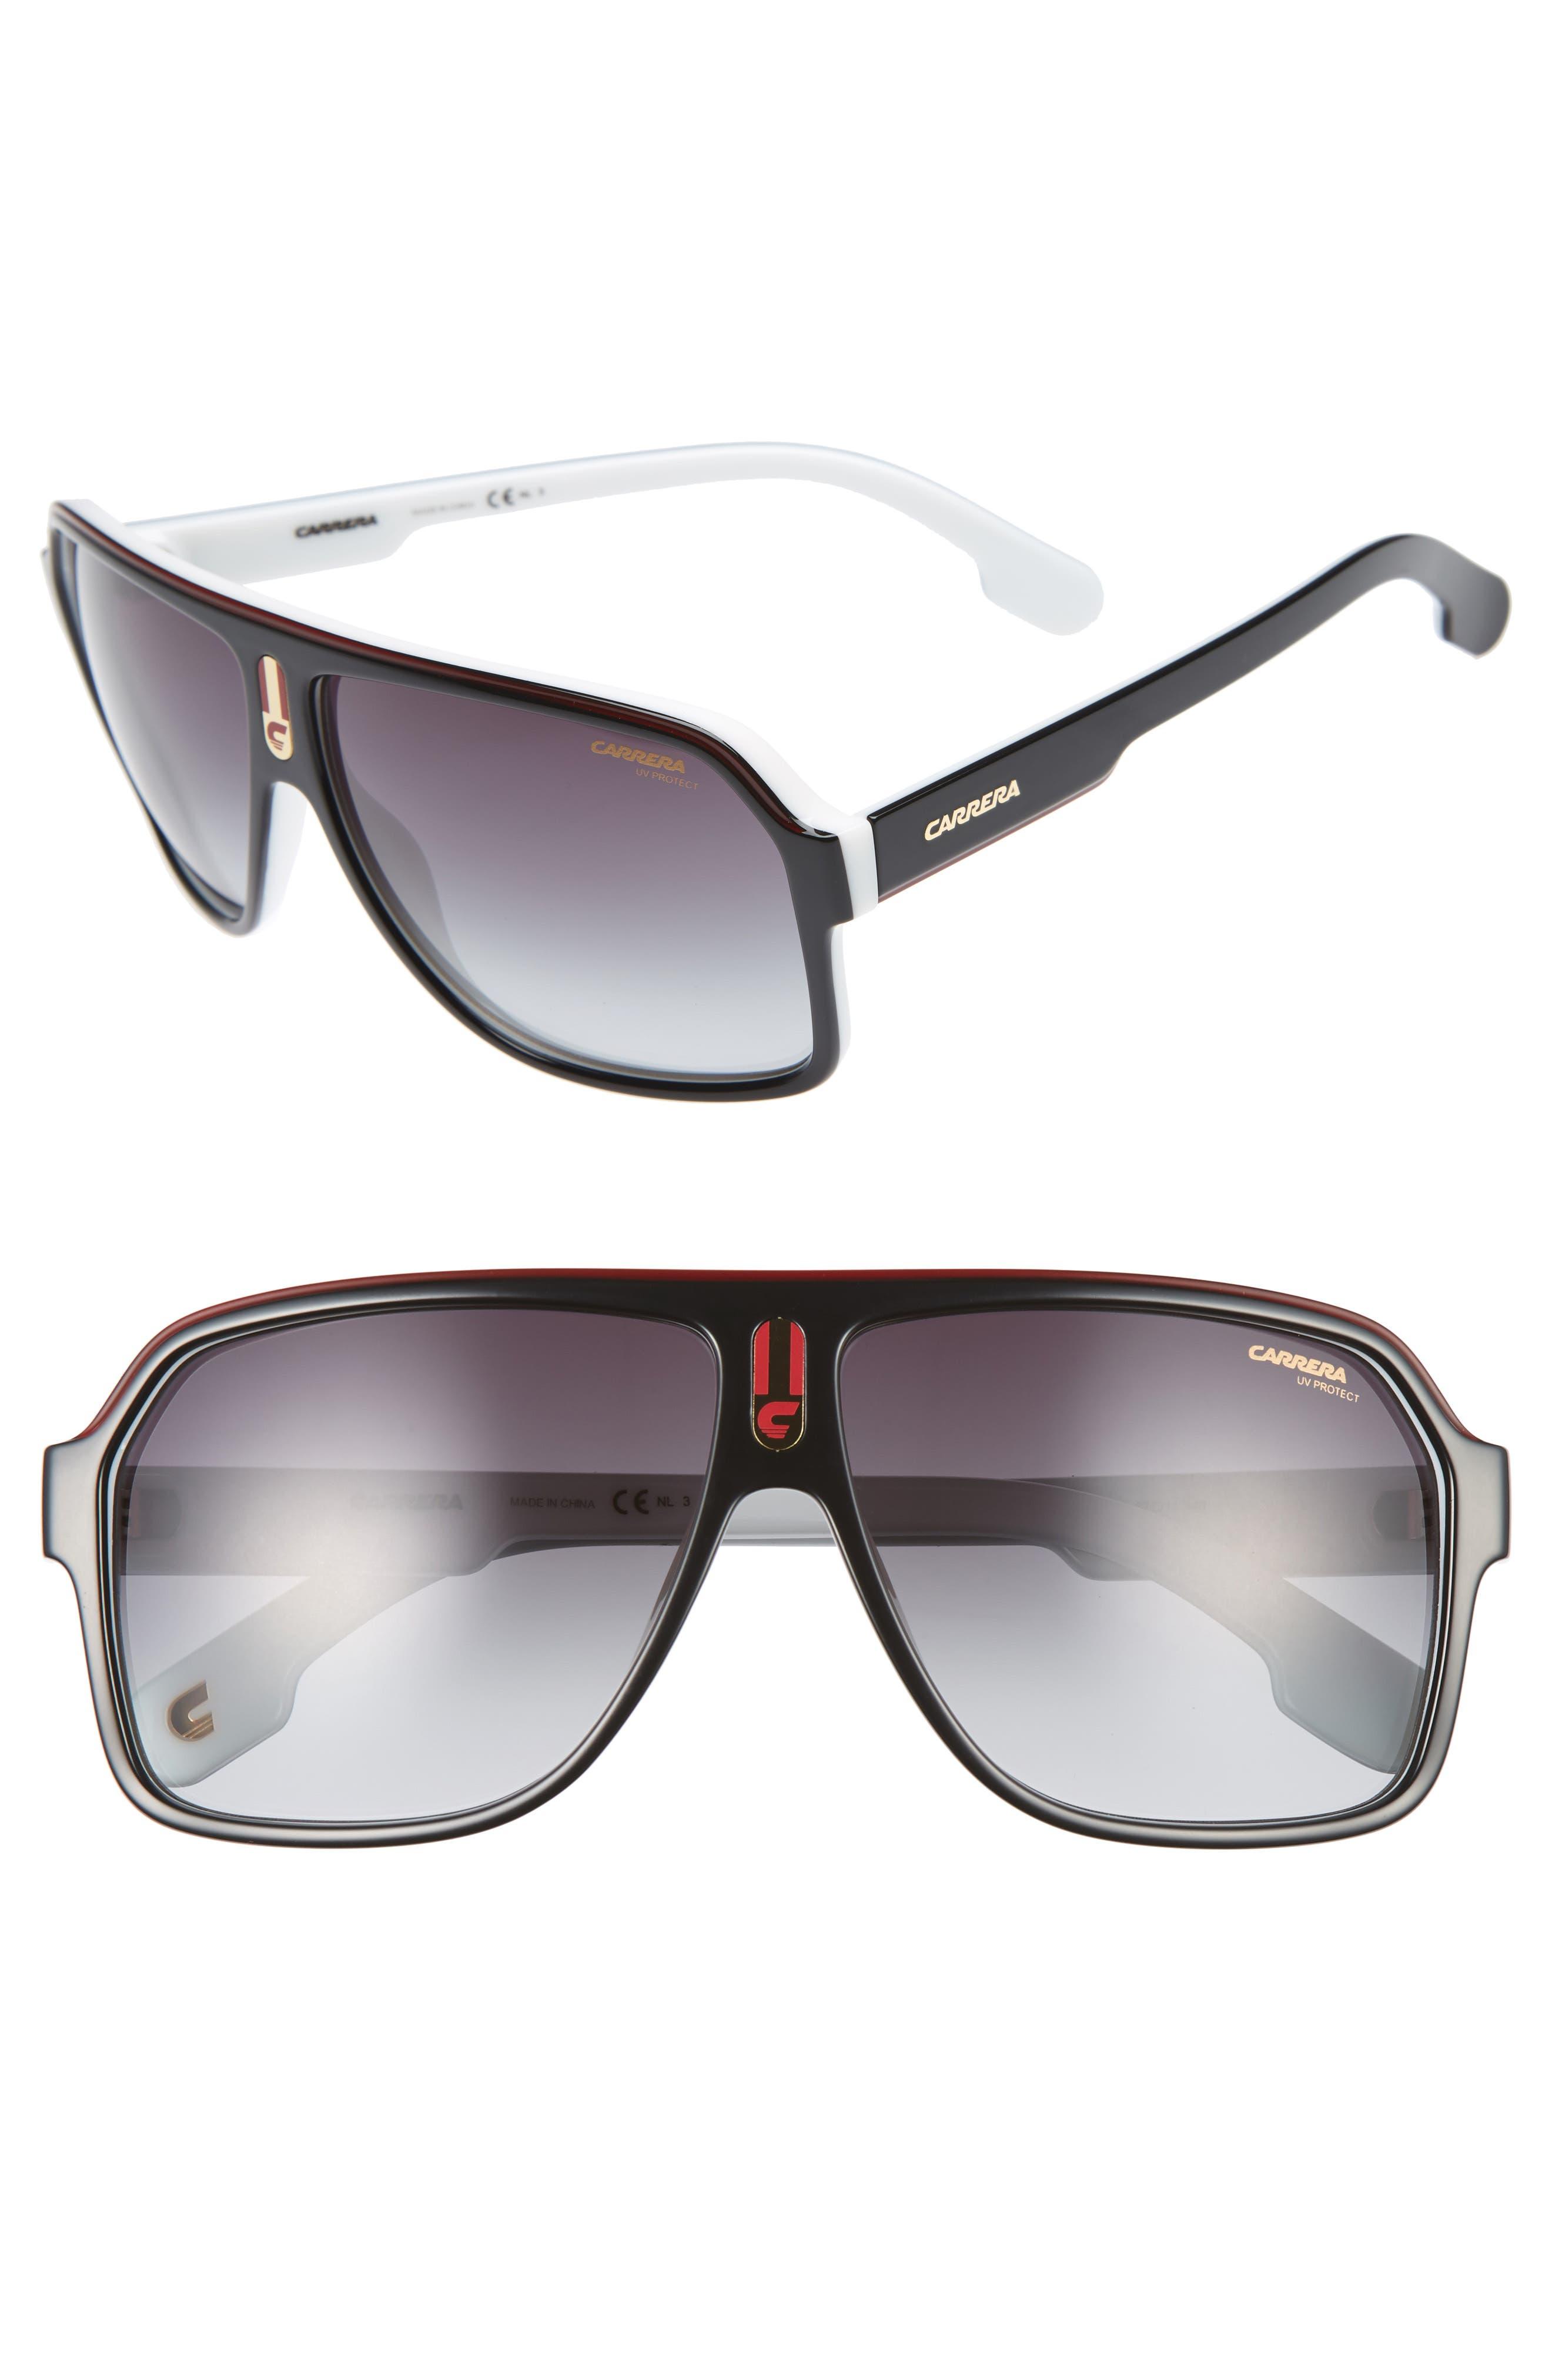 62mm Aviator Sunglasses,                             Main thumbnail 1, color,